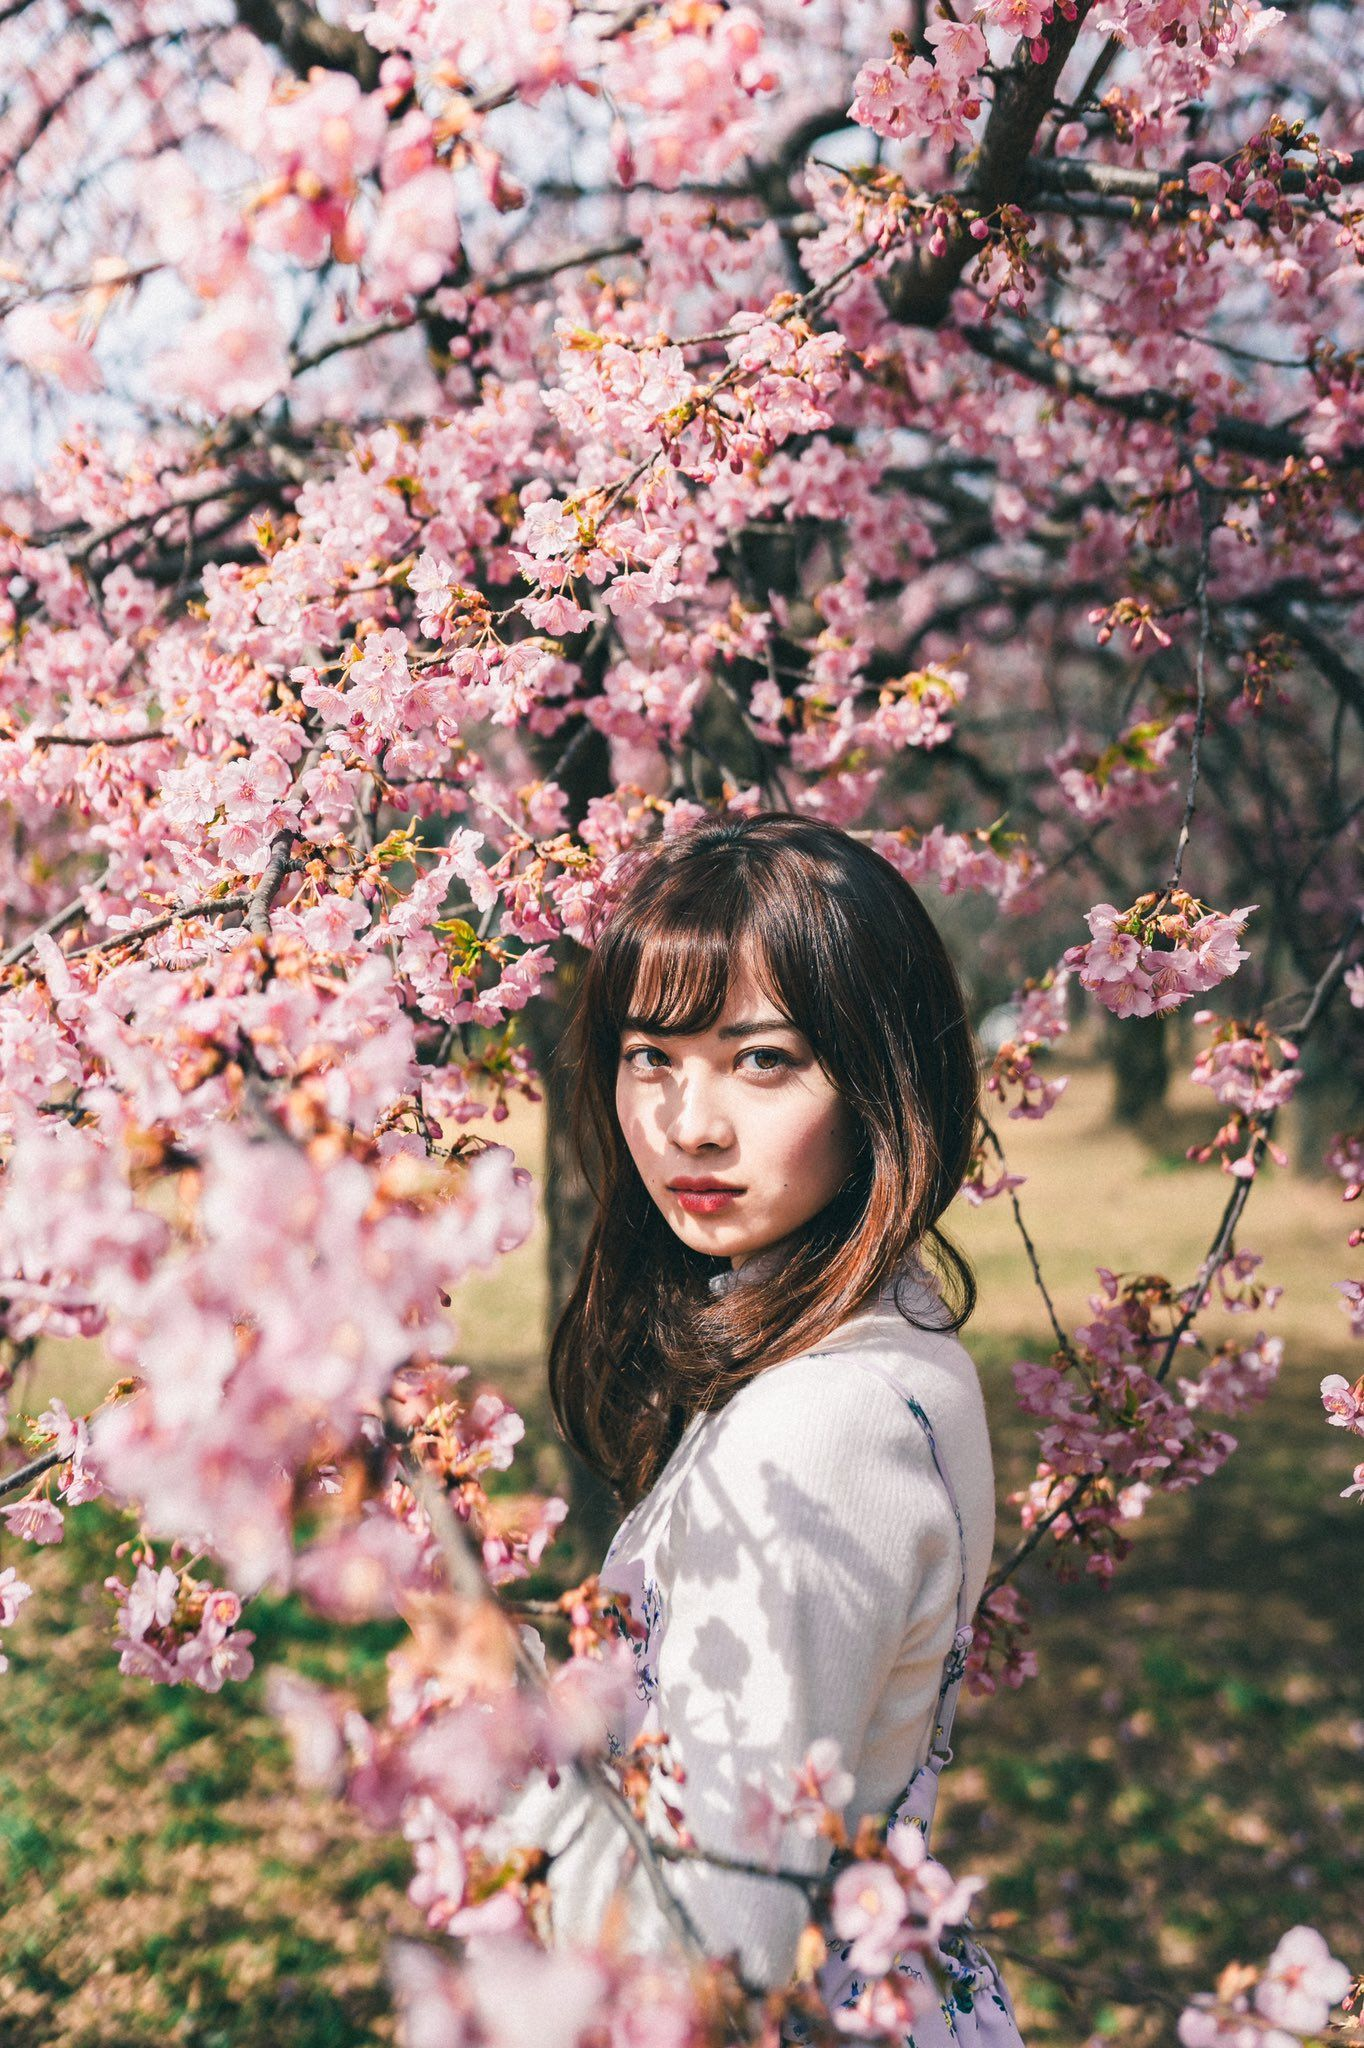 Ryo Ogawa On Twitter Spring Photography Spring Portraits Spring Photoshoot